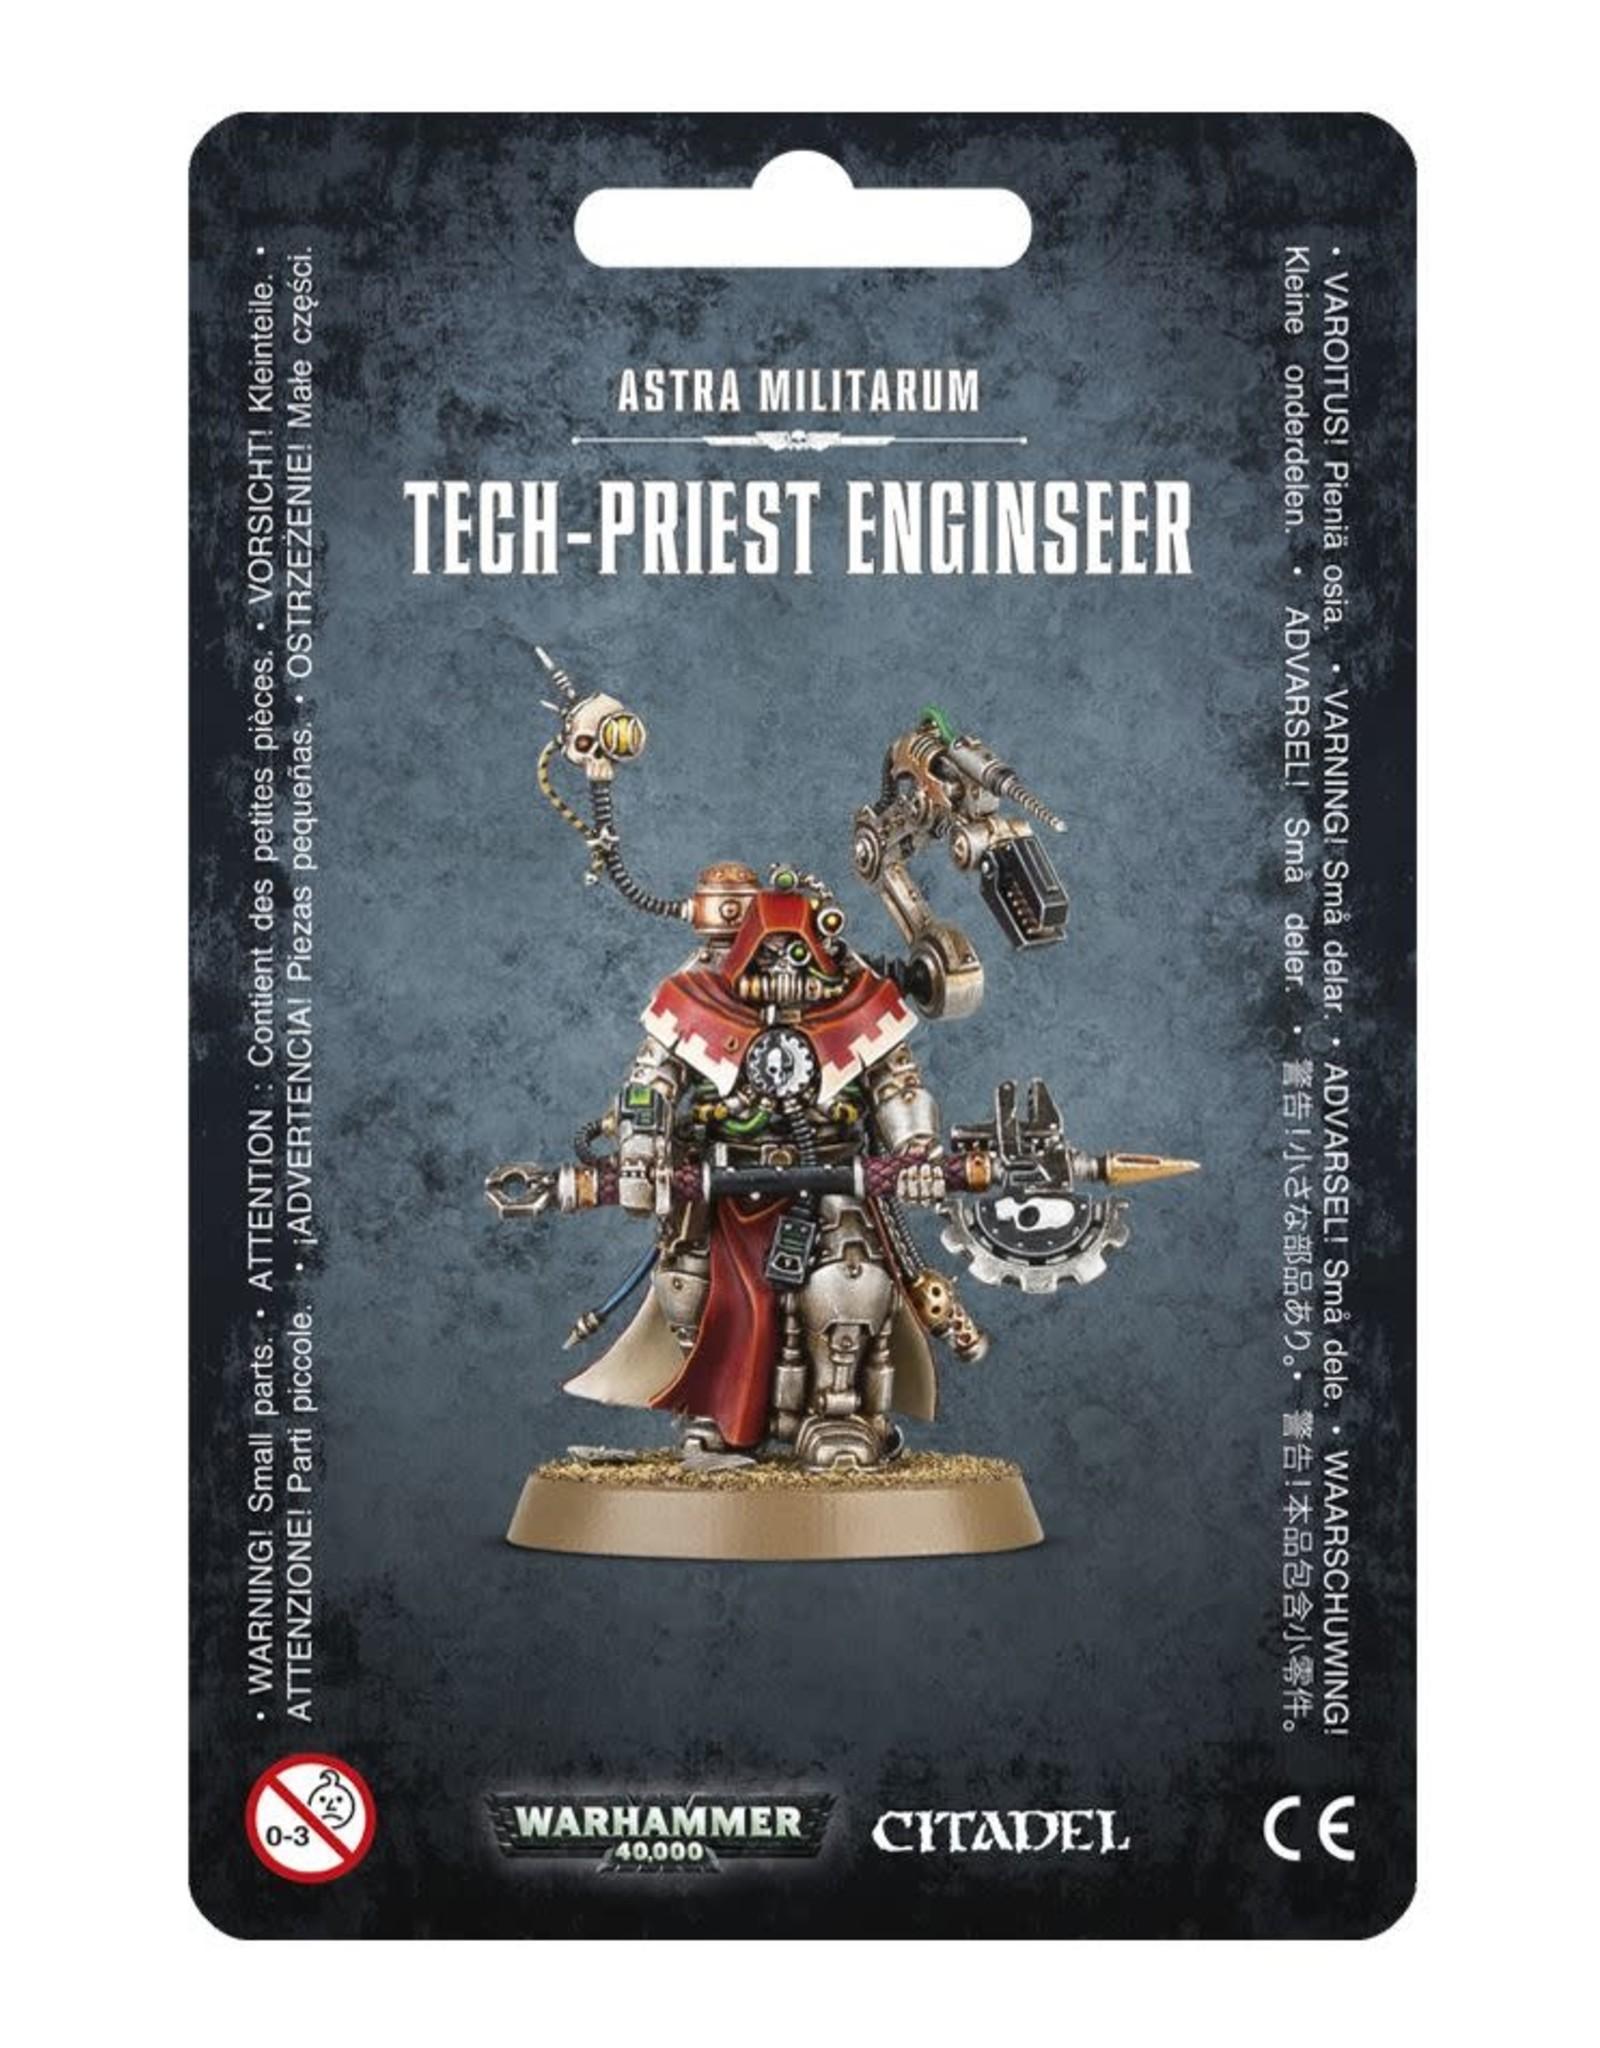 Warhammer 40K Tech-Priest Engineseer